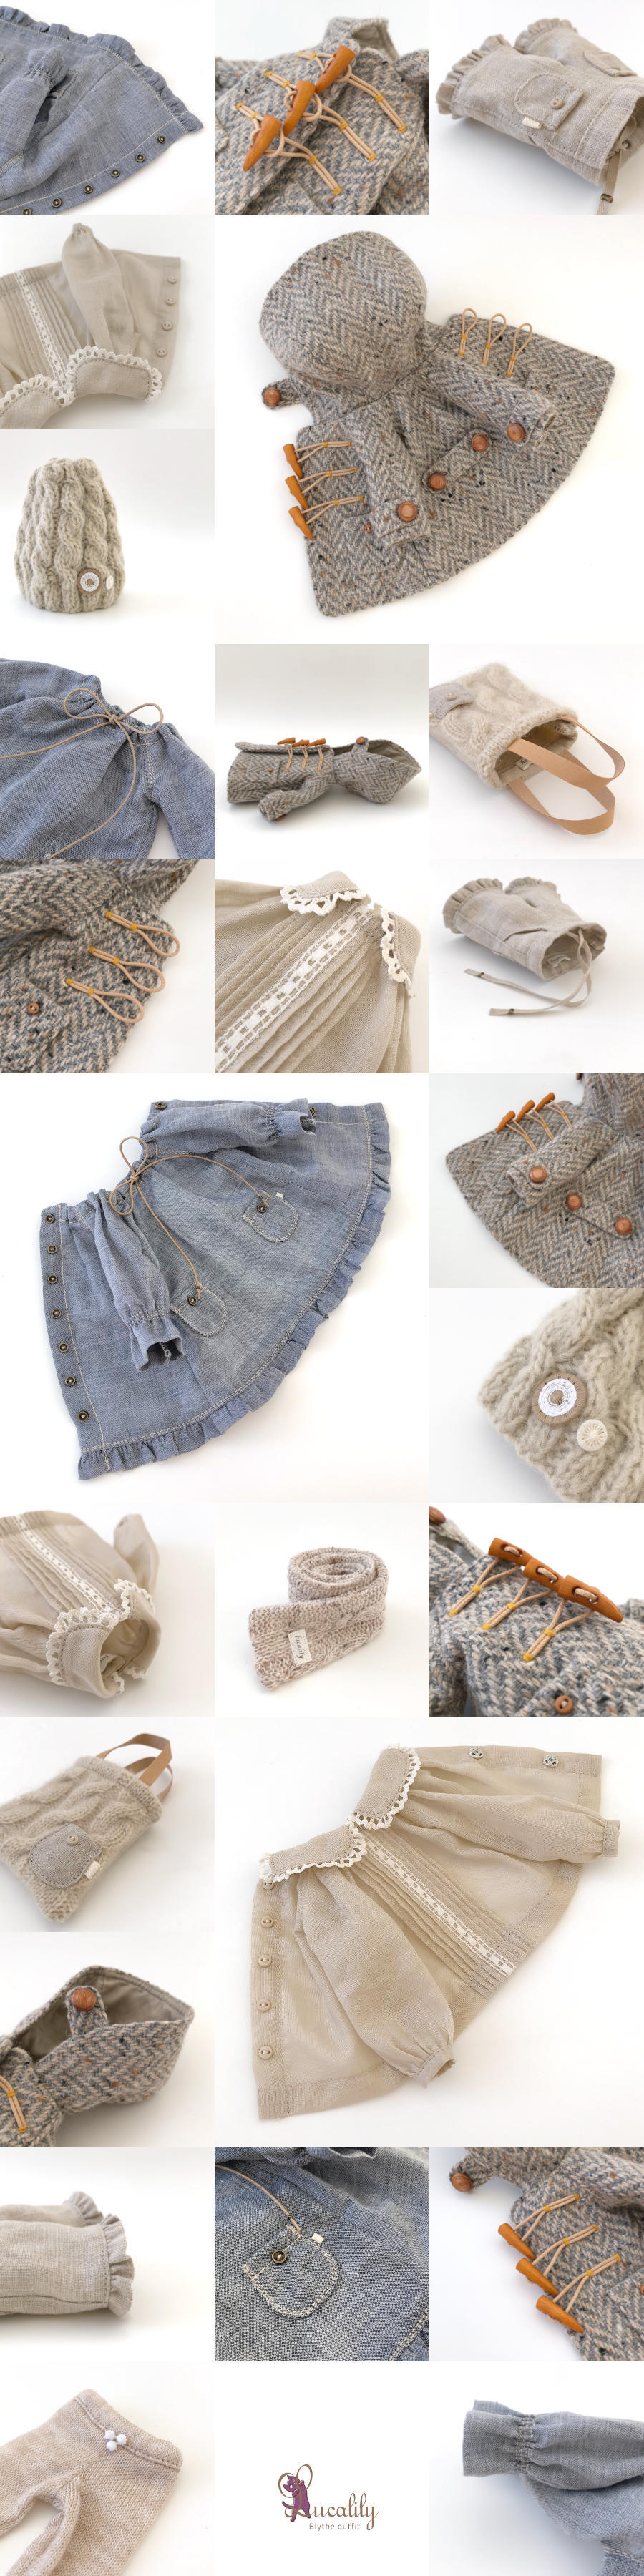 *lucalily * dolls clothes* Herringbone duffle coat set *_d0217189_19080279.jpg